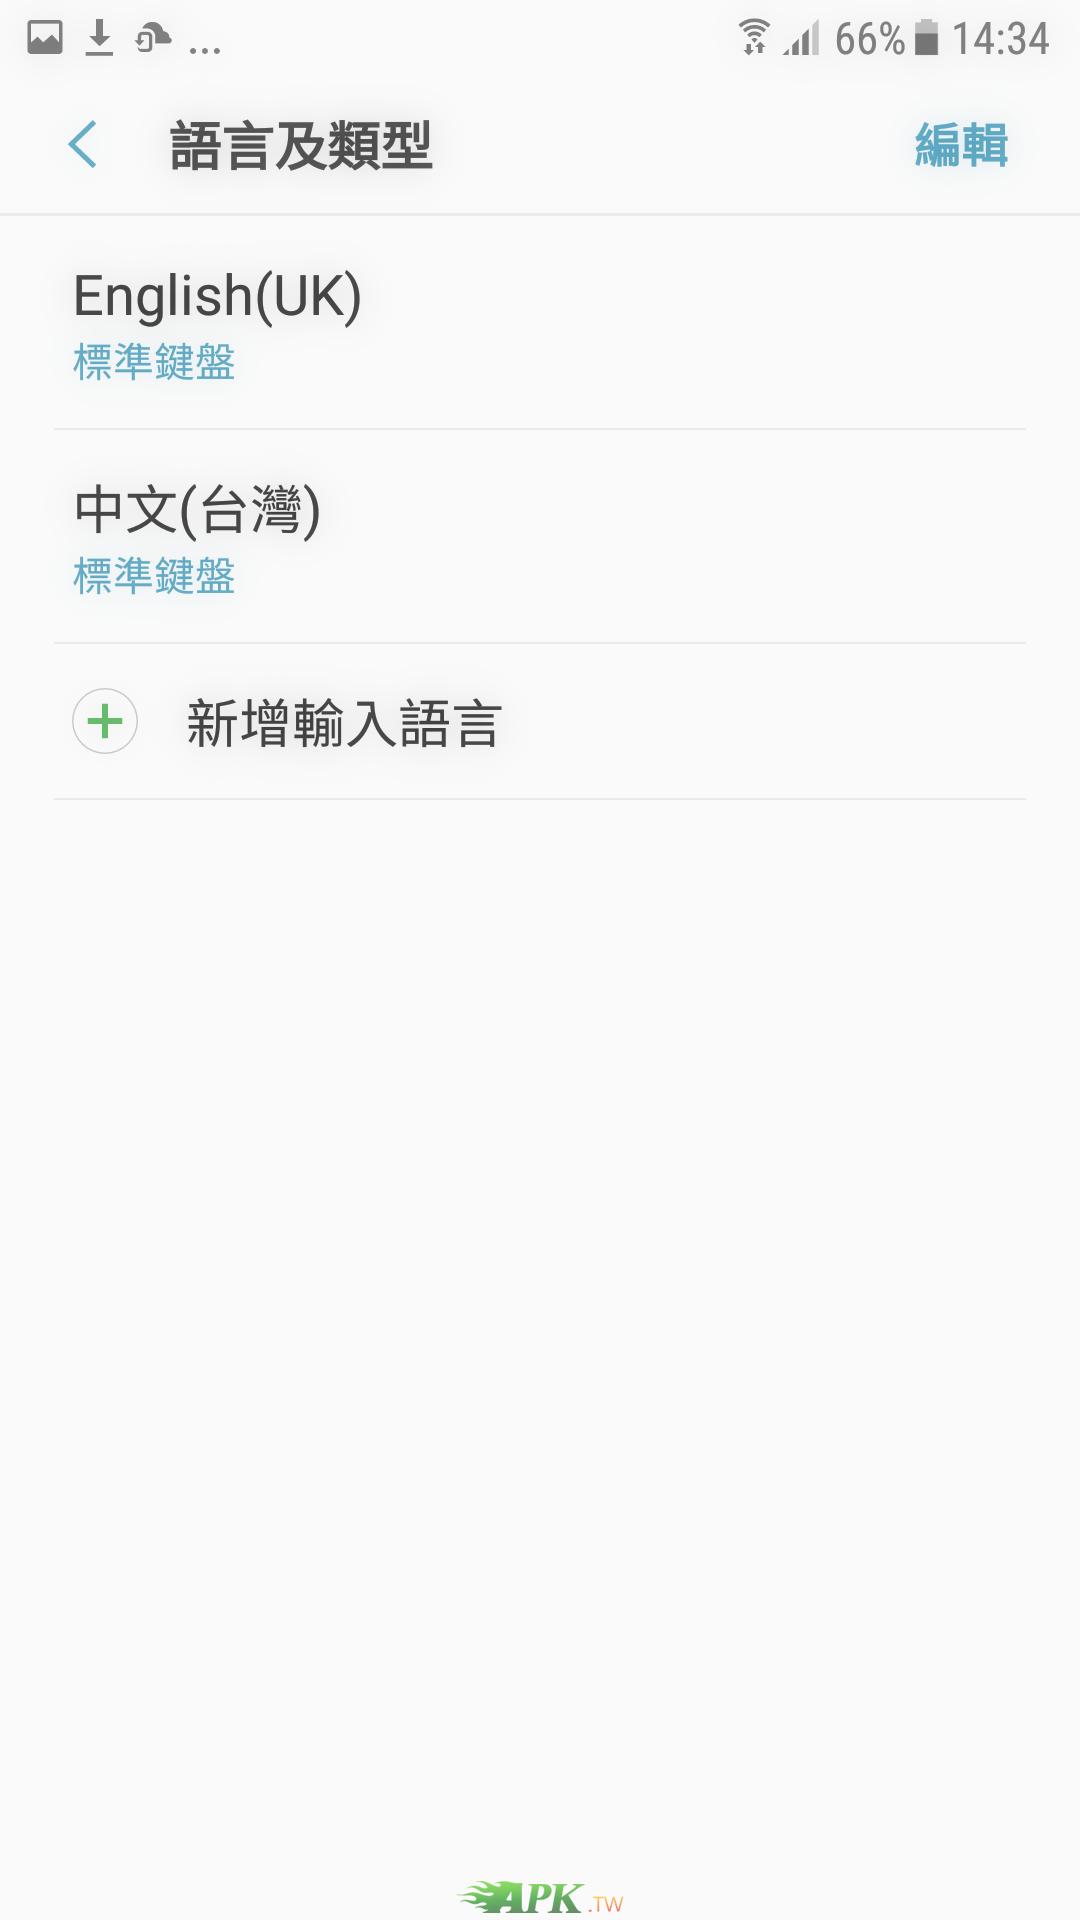 Screenshot_20170207-143443.png